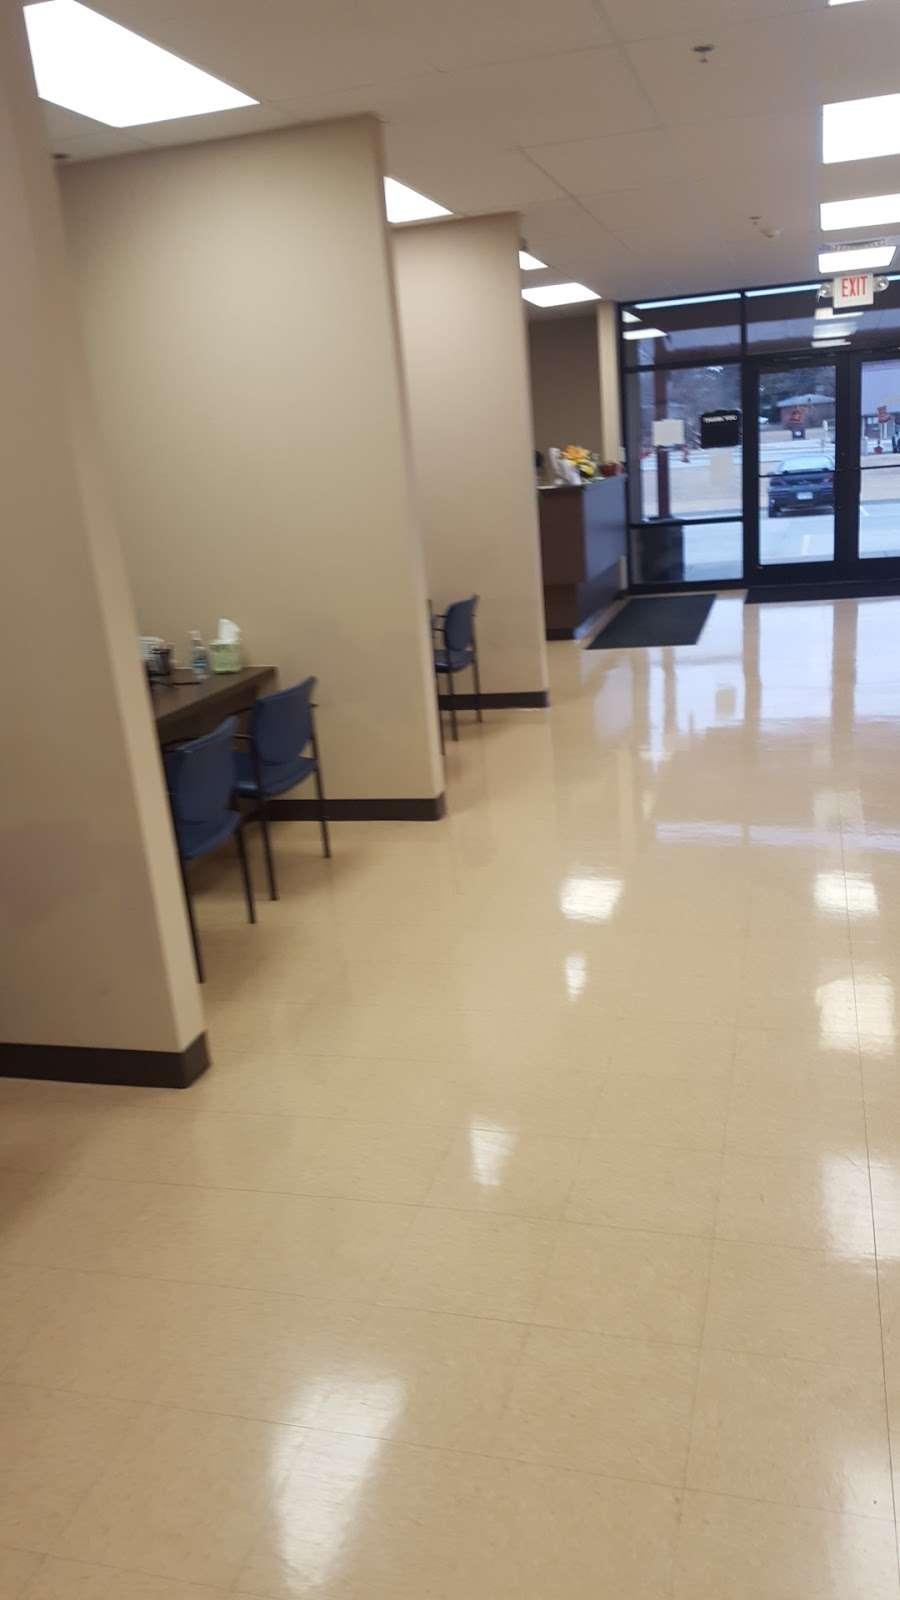 Samaritan Center - store  | Photo 2 of 3 | Address: 1317 S 2nd St, Clinton, MO 64735, USA | Phone: (660) 885-3407